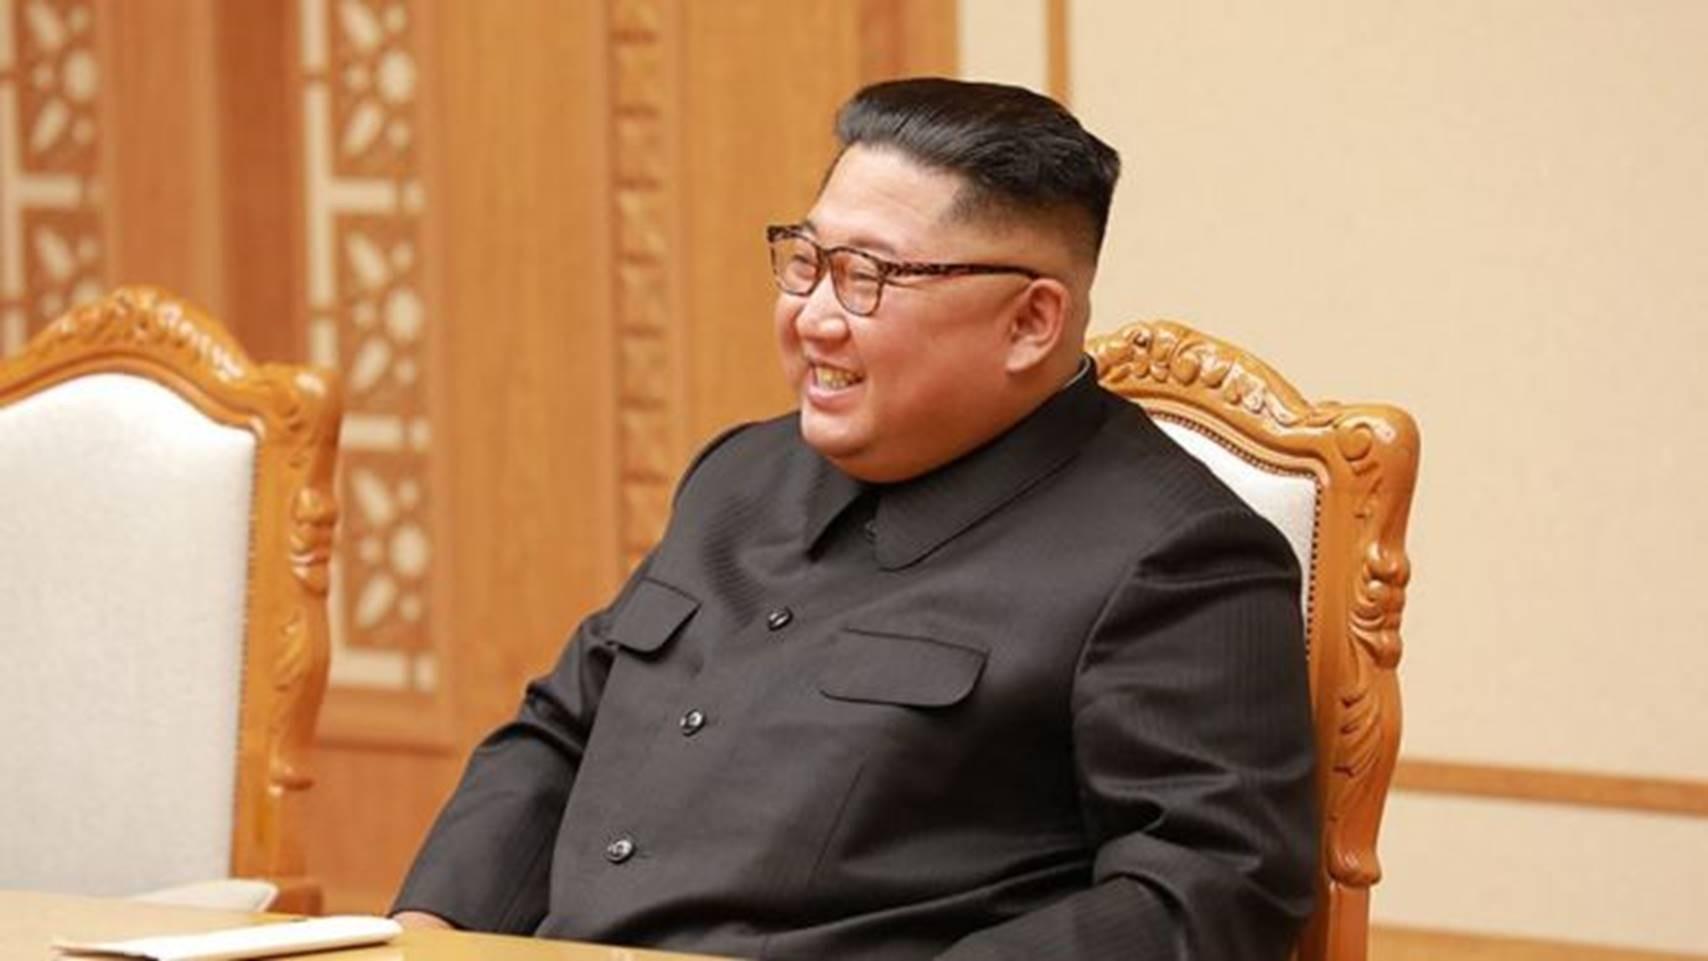 Coronavírus na Coreia do Norte: Kim Jong-un declara 'sucesso brilhante' no combate à pandemia e zero caso